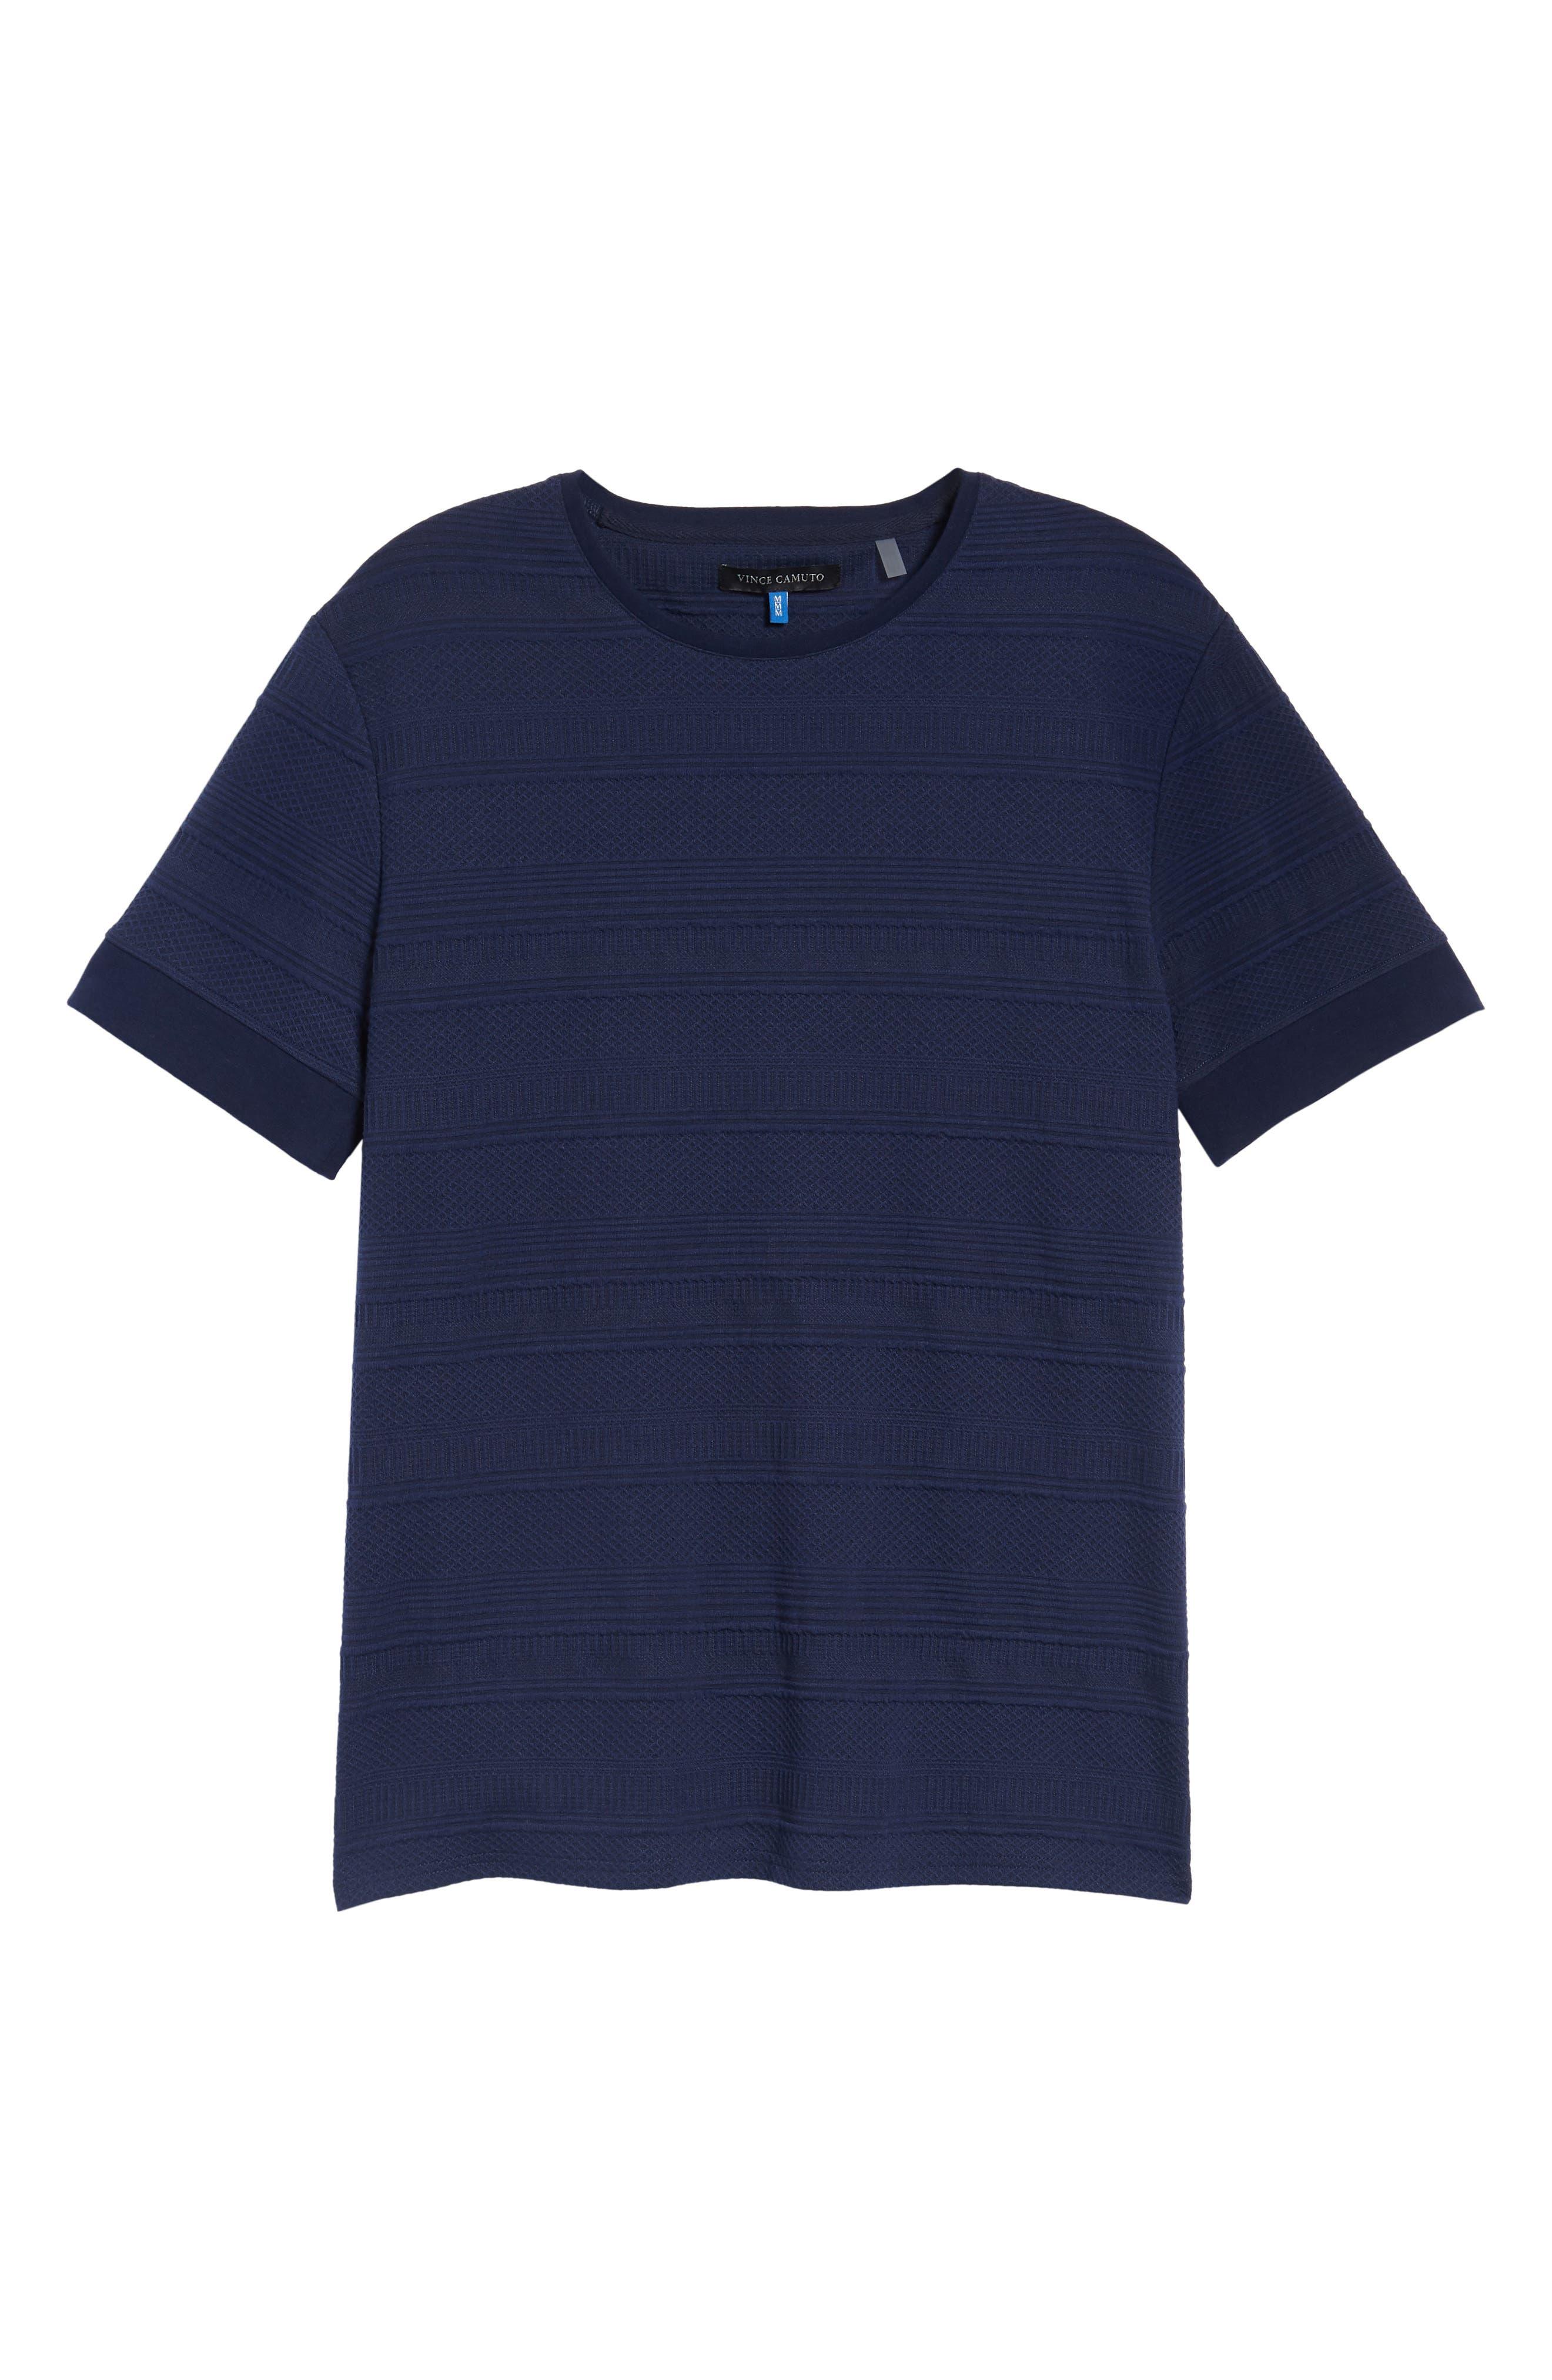 Banded Cuff Crewneck T-Shirt,                             Alternate thumbnail 6, color,                             410